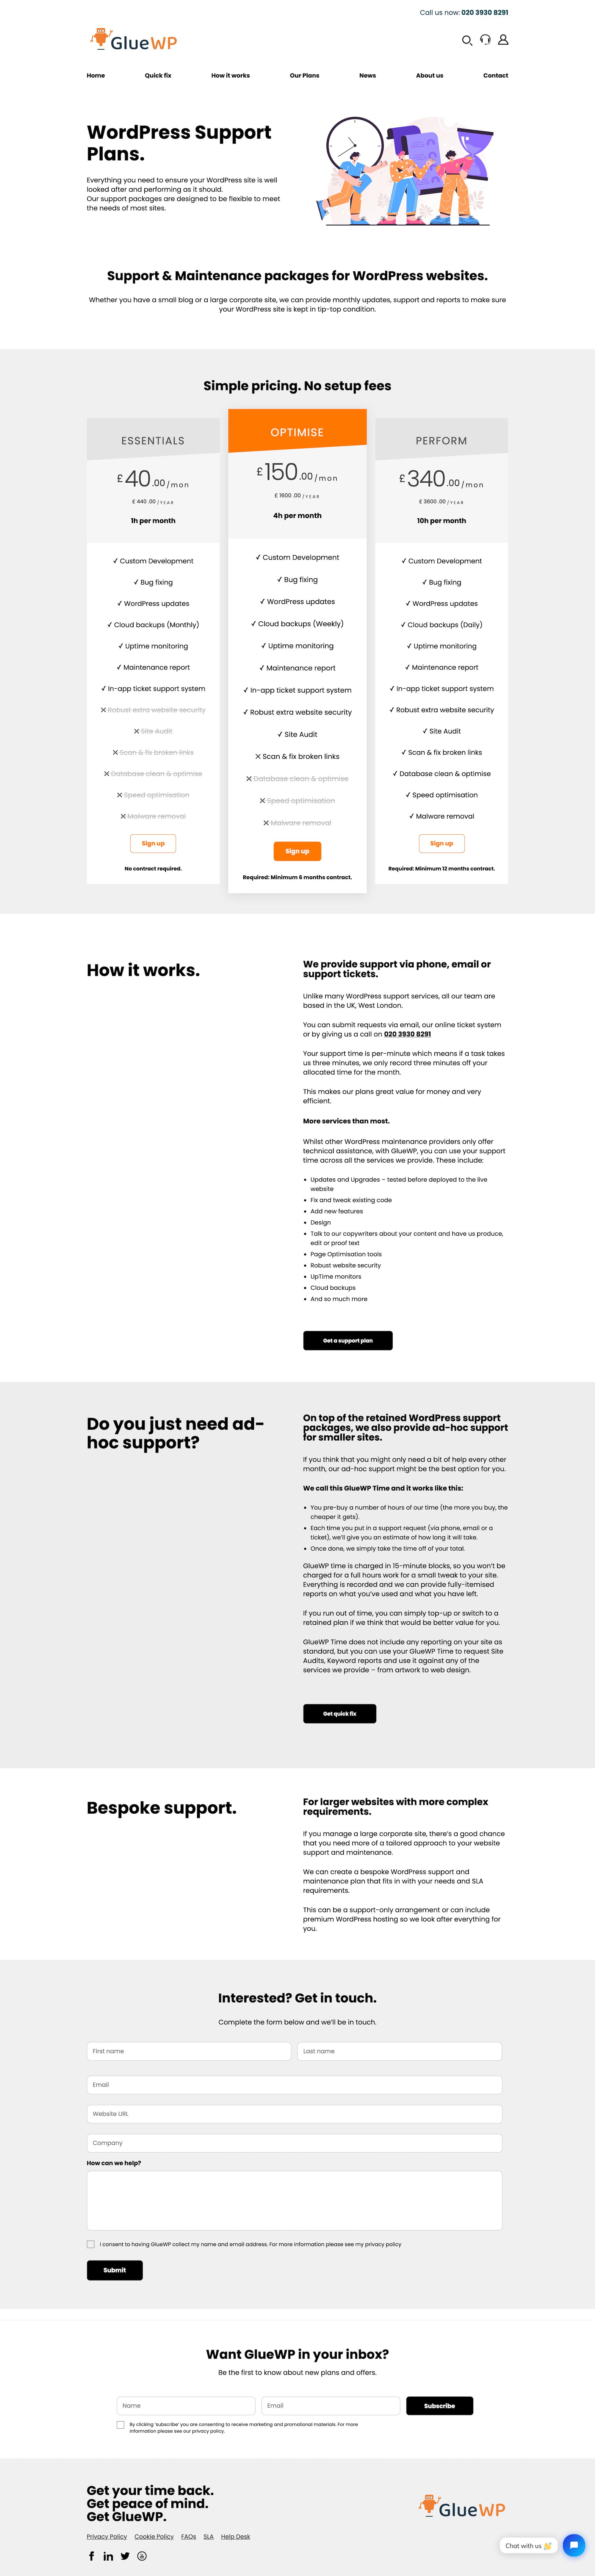 GlueWP WordPress Support Plans